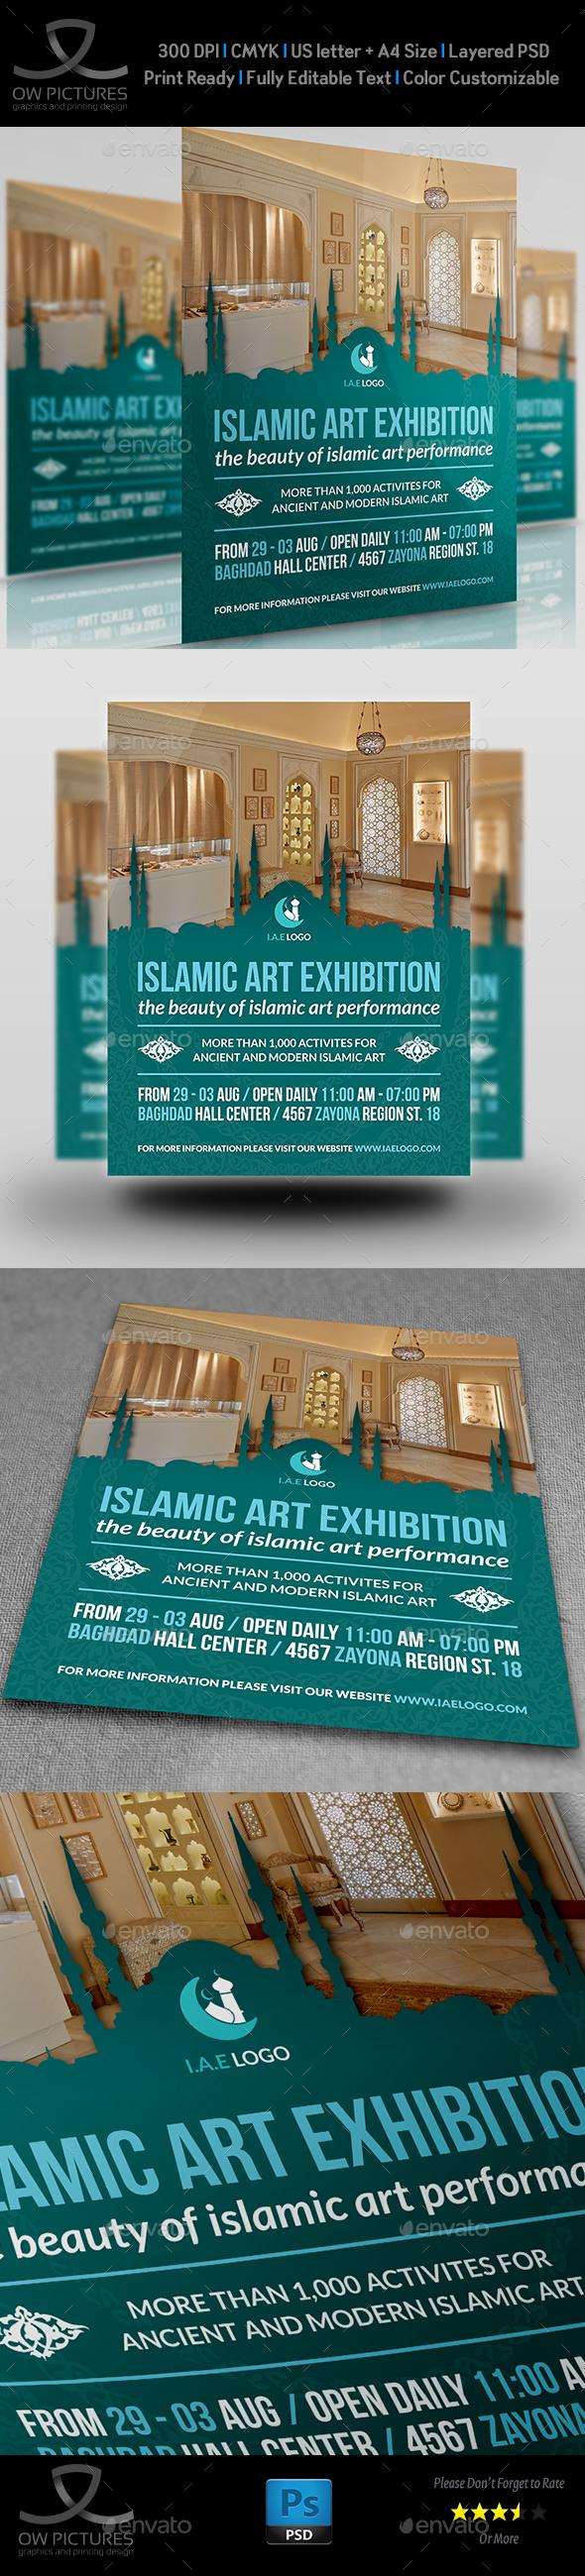 Islamic Art Exhibition Flyer Template - Flyers Print Templates